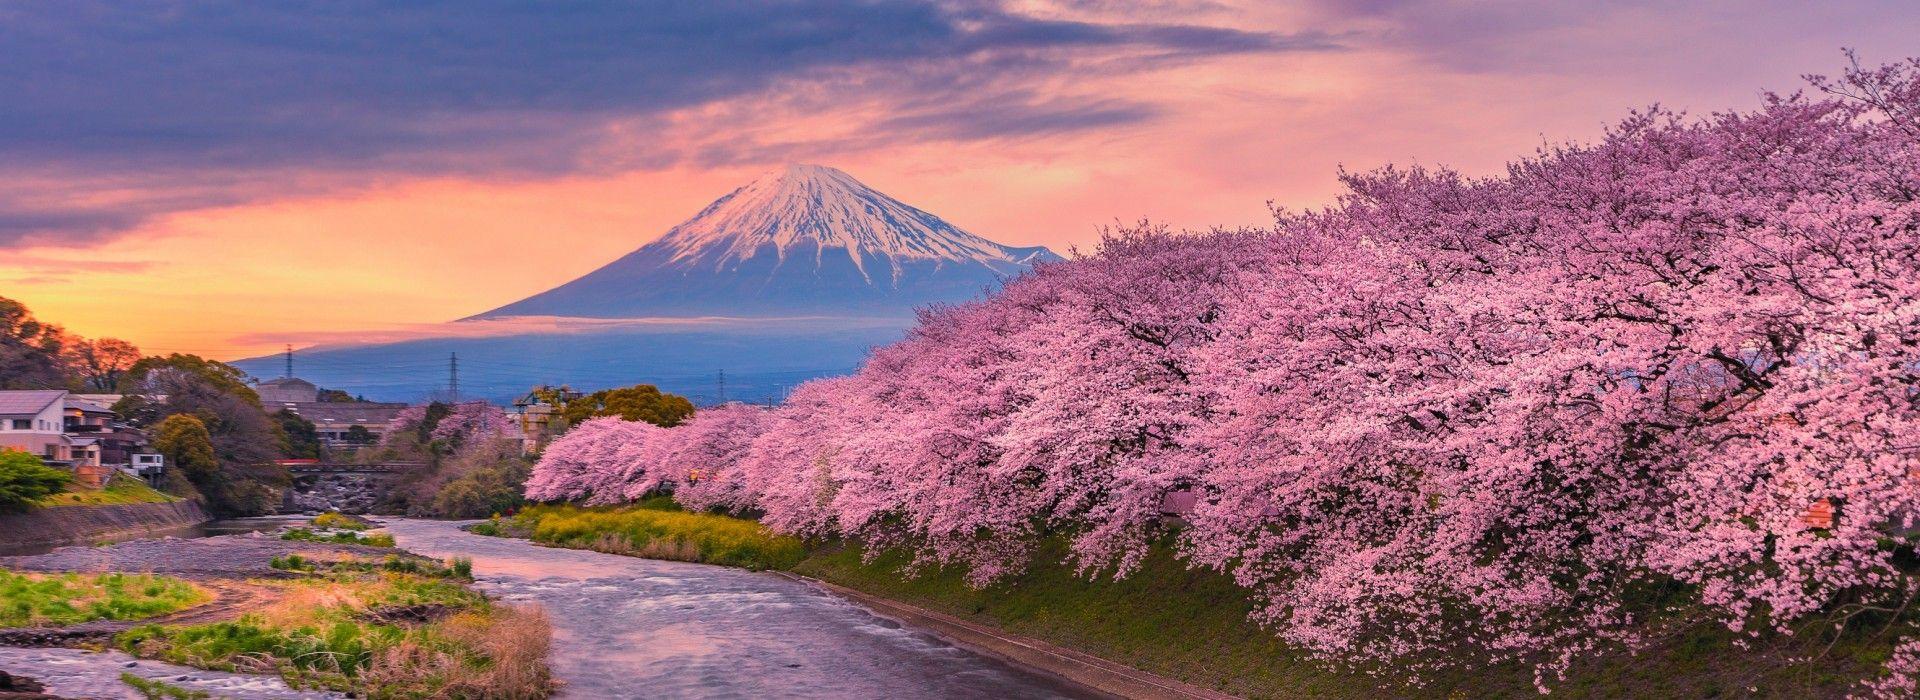 War sites Tours in Japan